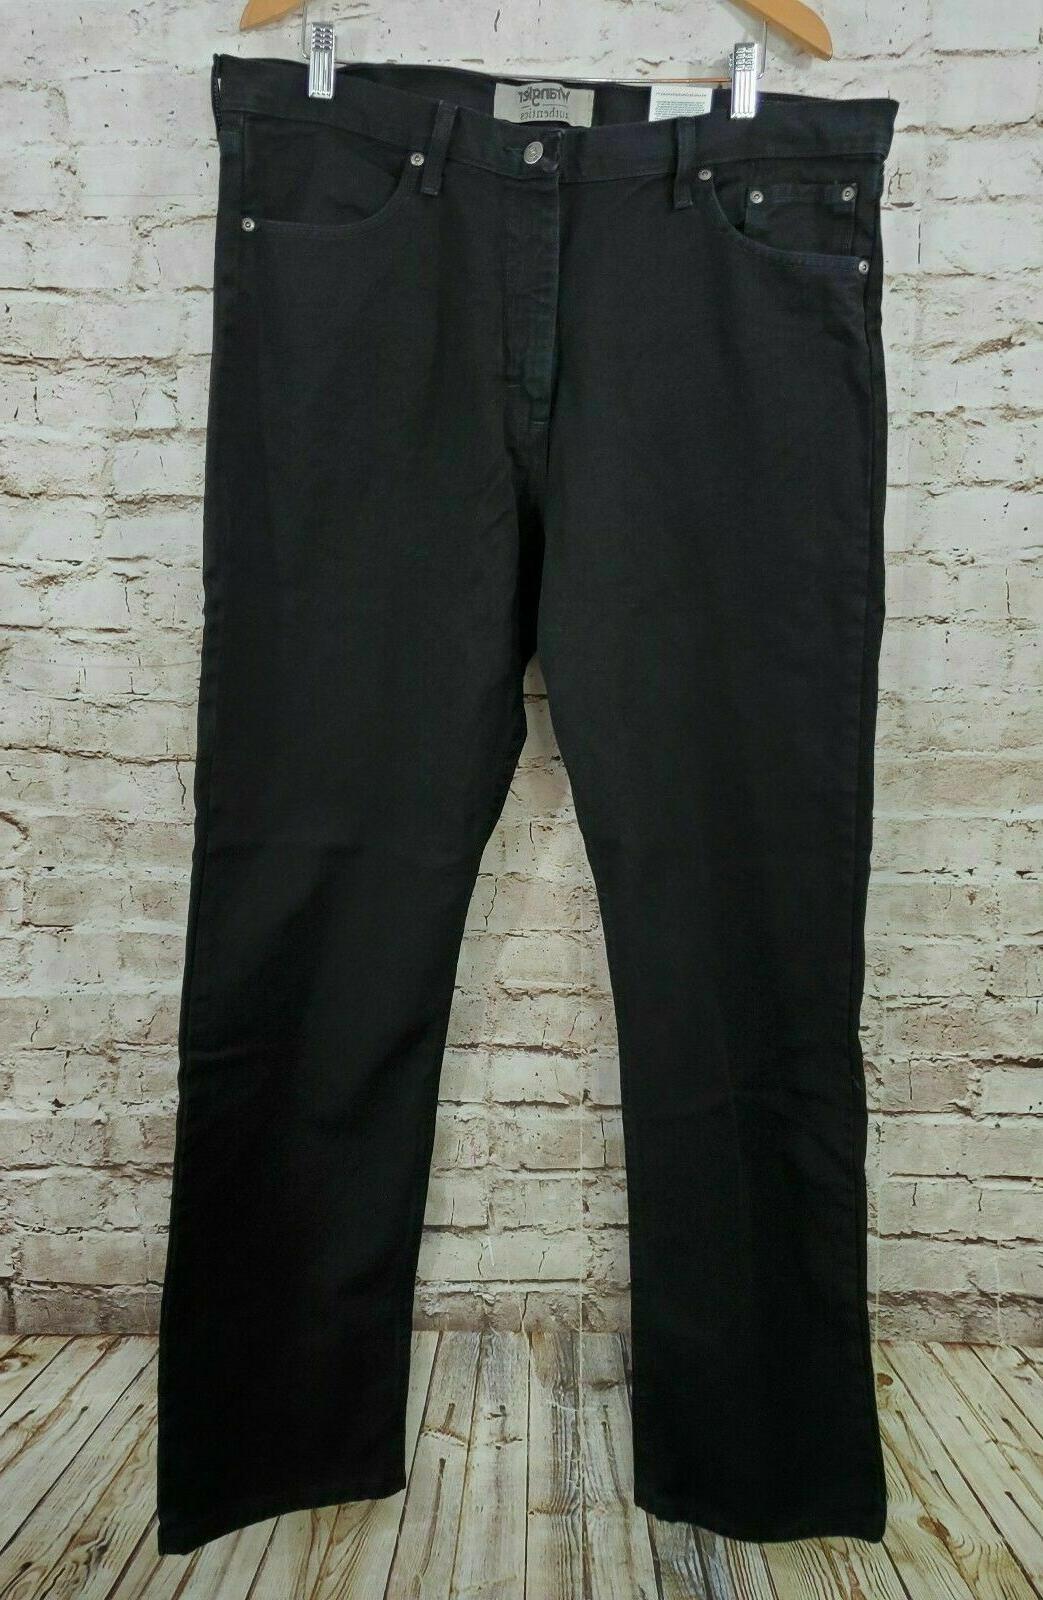 Wrangler Authentics Men's Classic 5-Pocket Relaxed Fit Flex